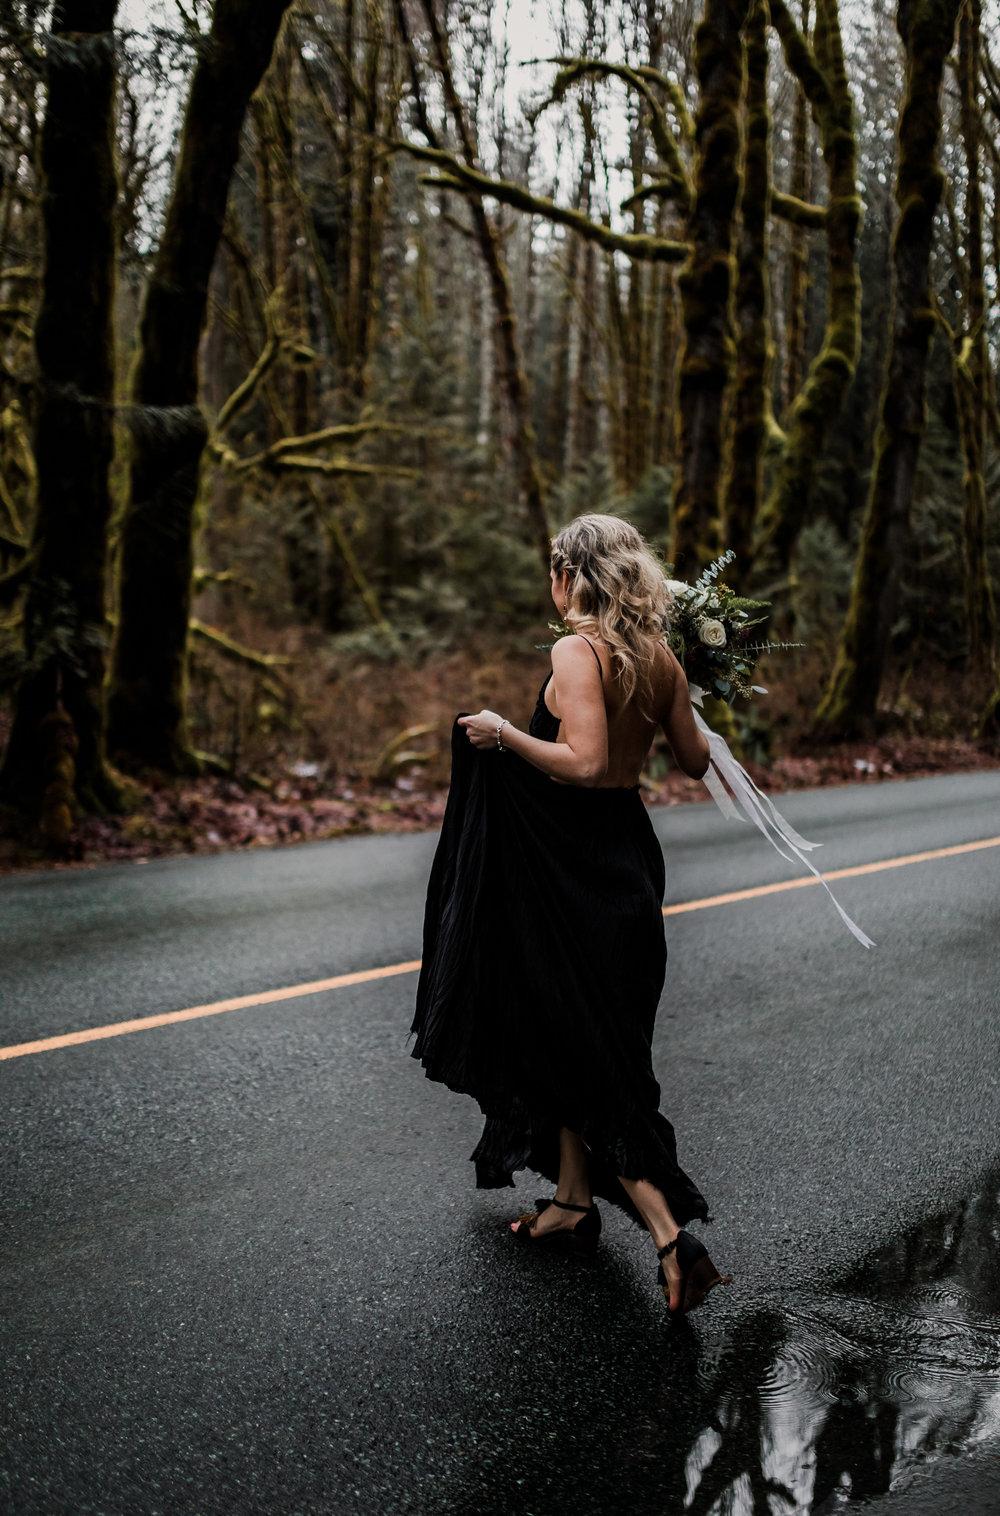 Squamish Engagement Photos - Squamish Wedding Photographer - Sunshine Coast Wedding Photographer - Vancouver Wedding Photographer - Jennifer Picard Photography - 1A5A3692.jpg